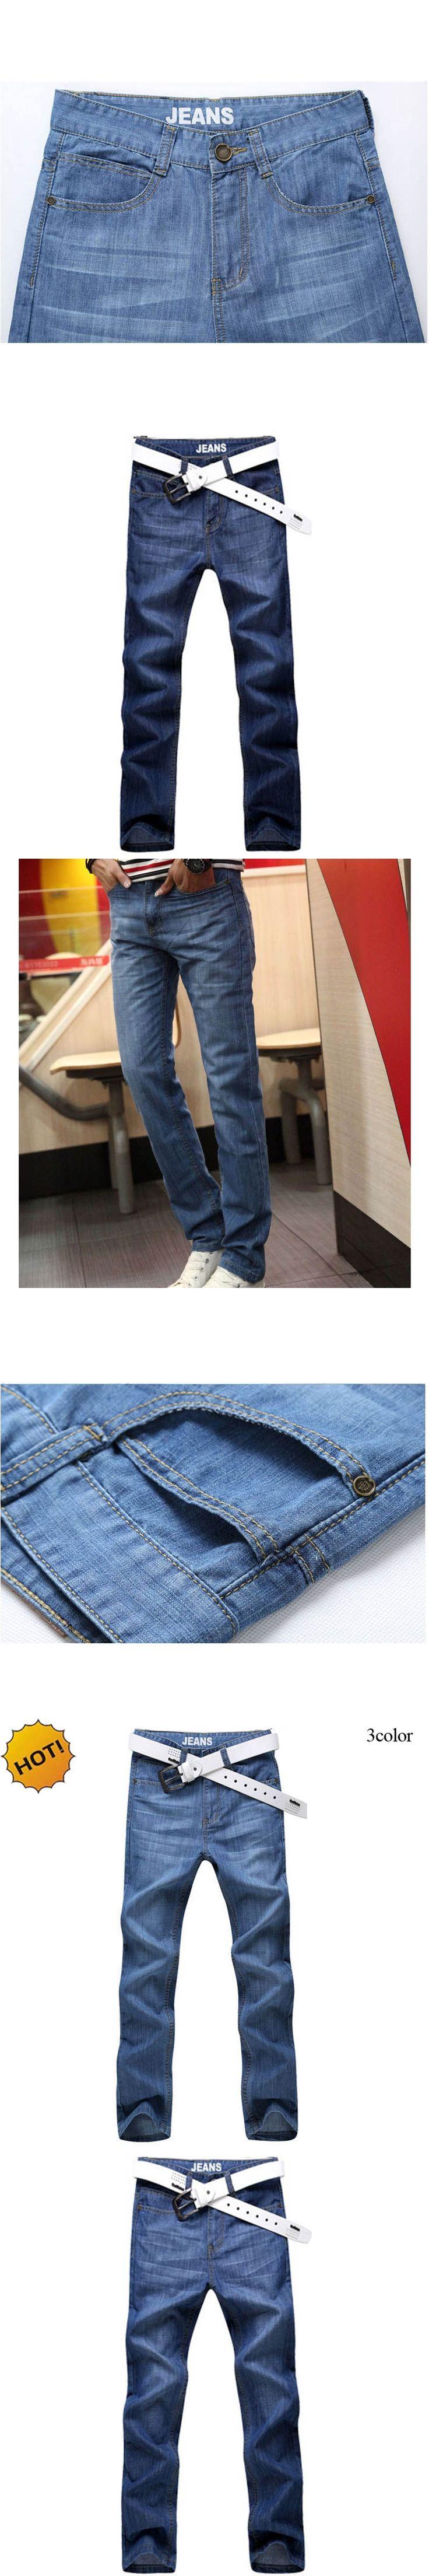 New Arrive 2017 Summer Ultra-thin High Quality Mens Denim Overalls soft cotton Men Slim Fit Biker Jeans Homme plus size 28-40